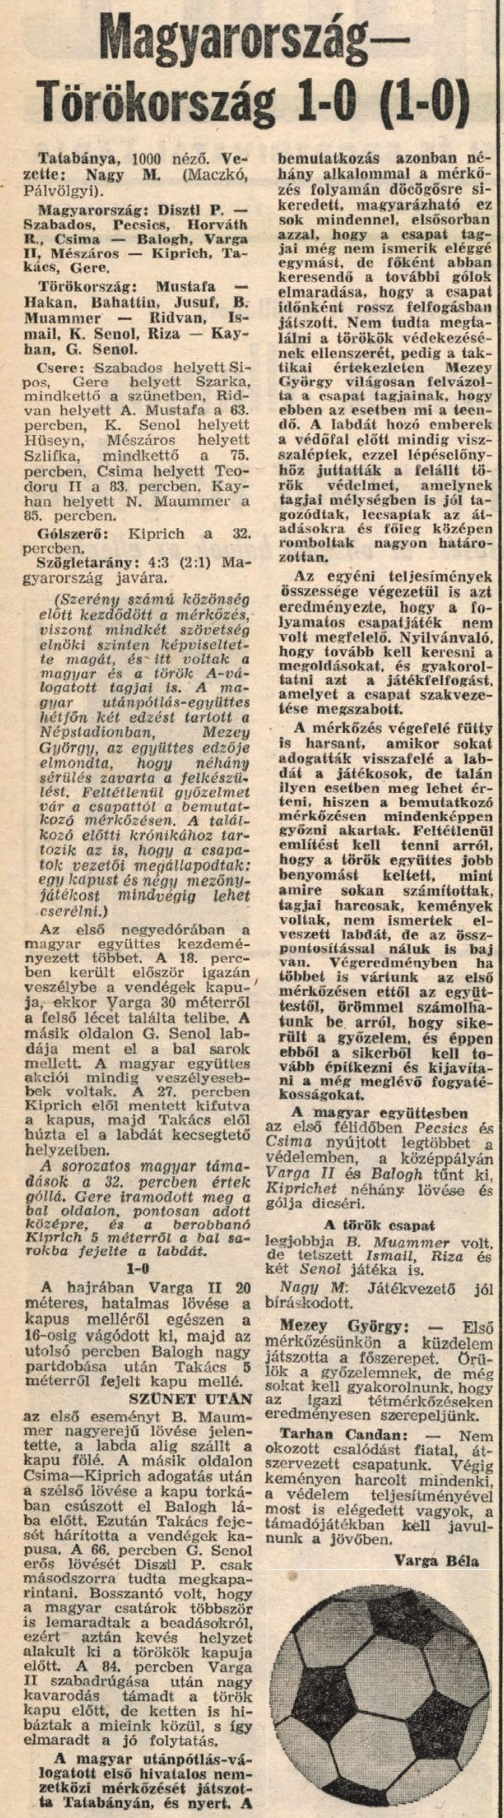 idokapszula_nb_i_1982_83_magyarorszag_torokorszag_utanpotlas.jpg